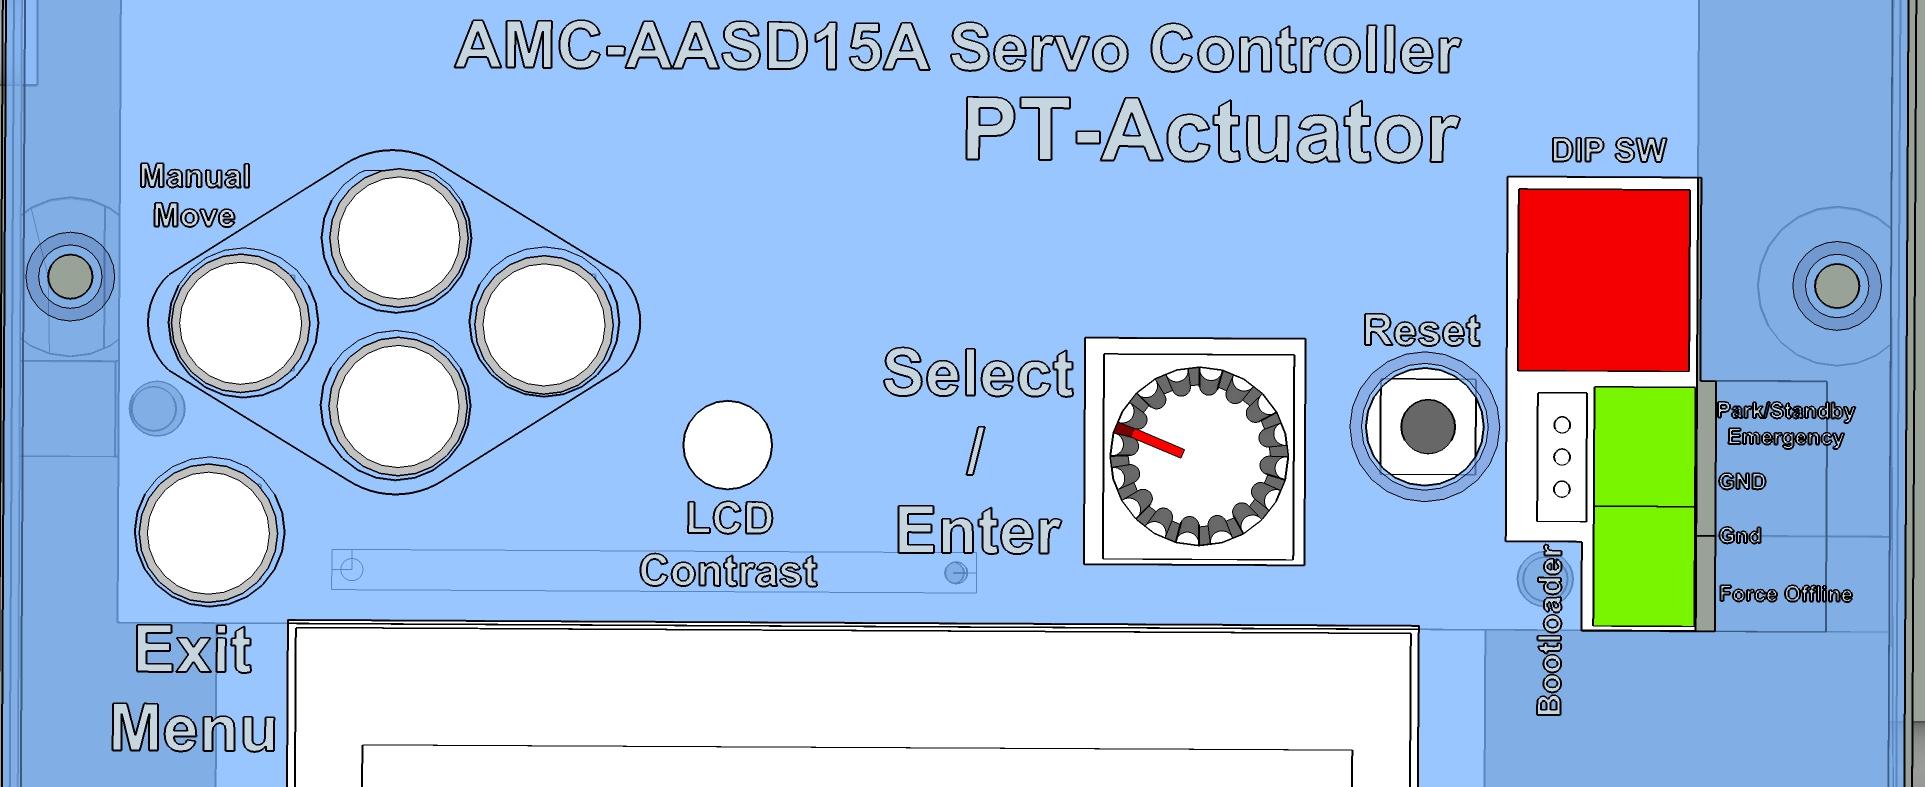 AMC-AASD15A_enclosure_2_labels_TOP_detail.jpg